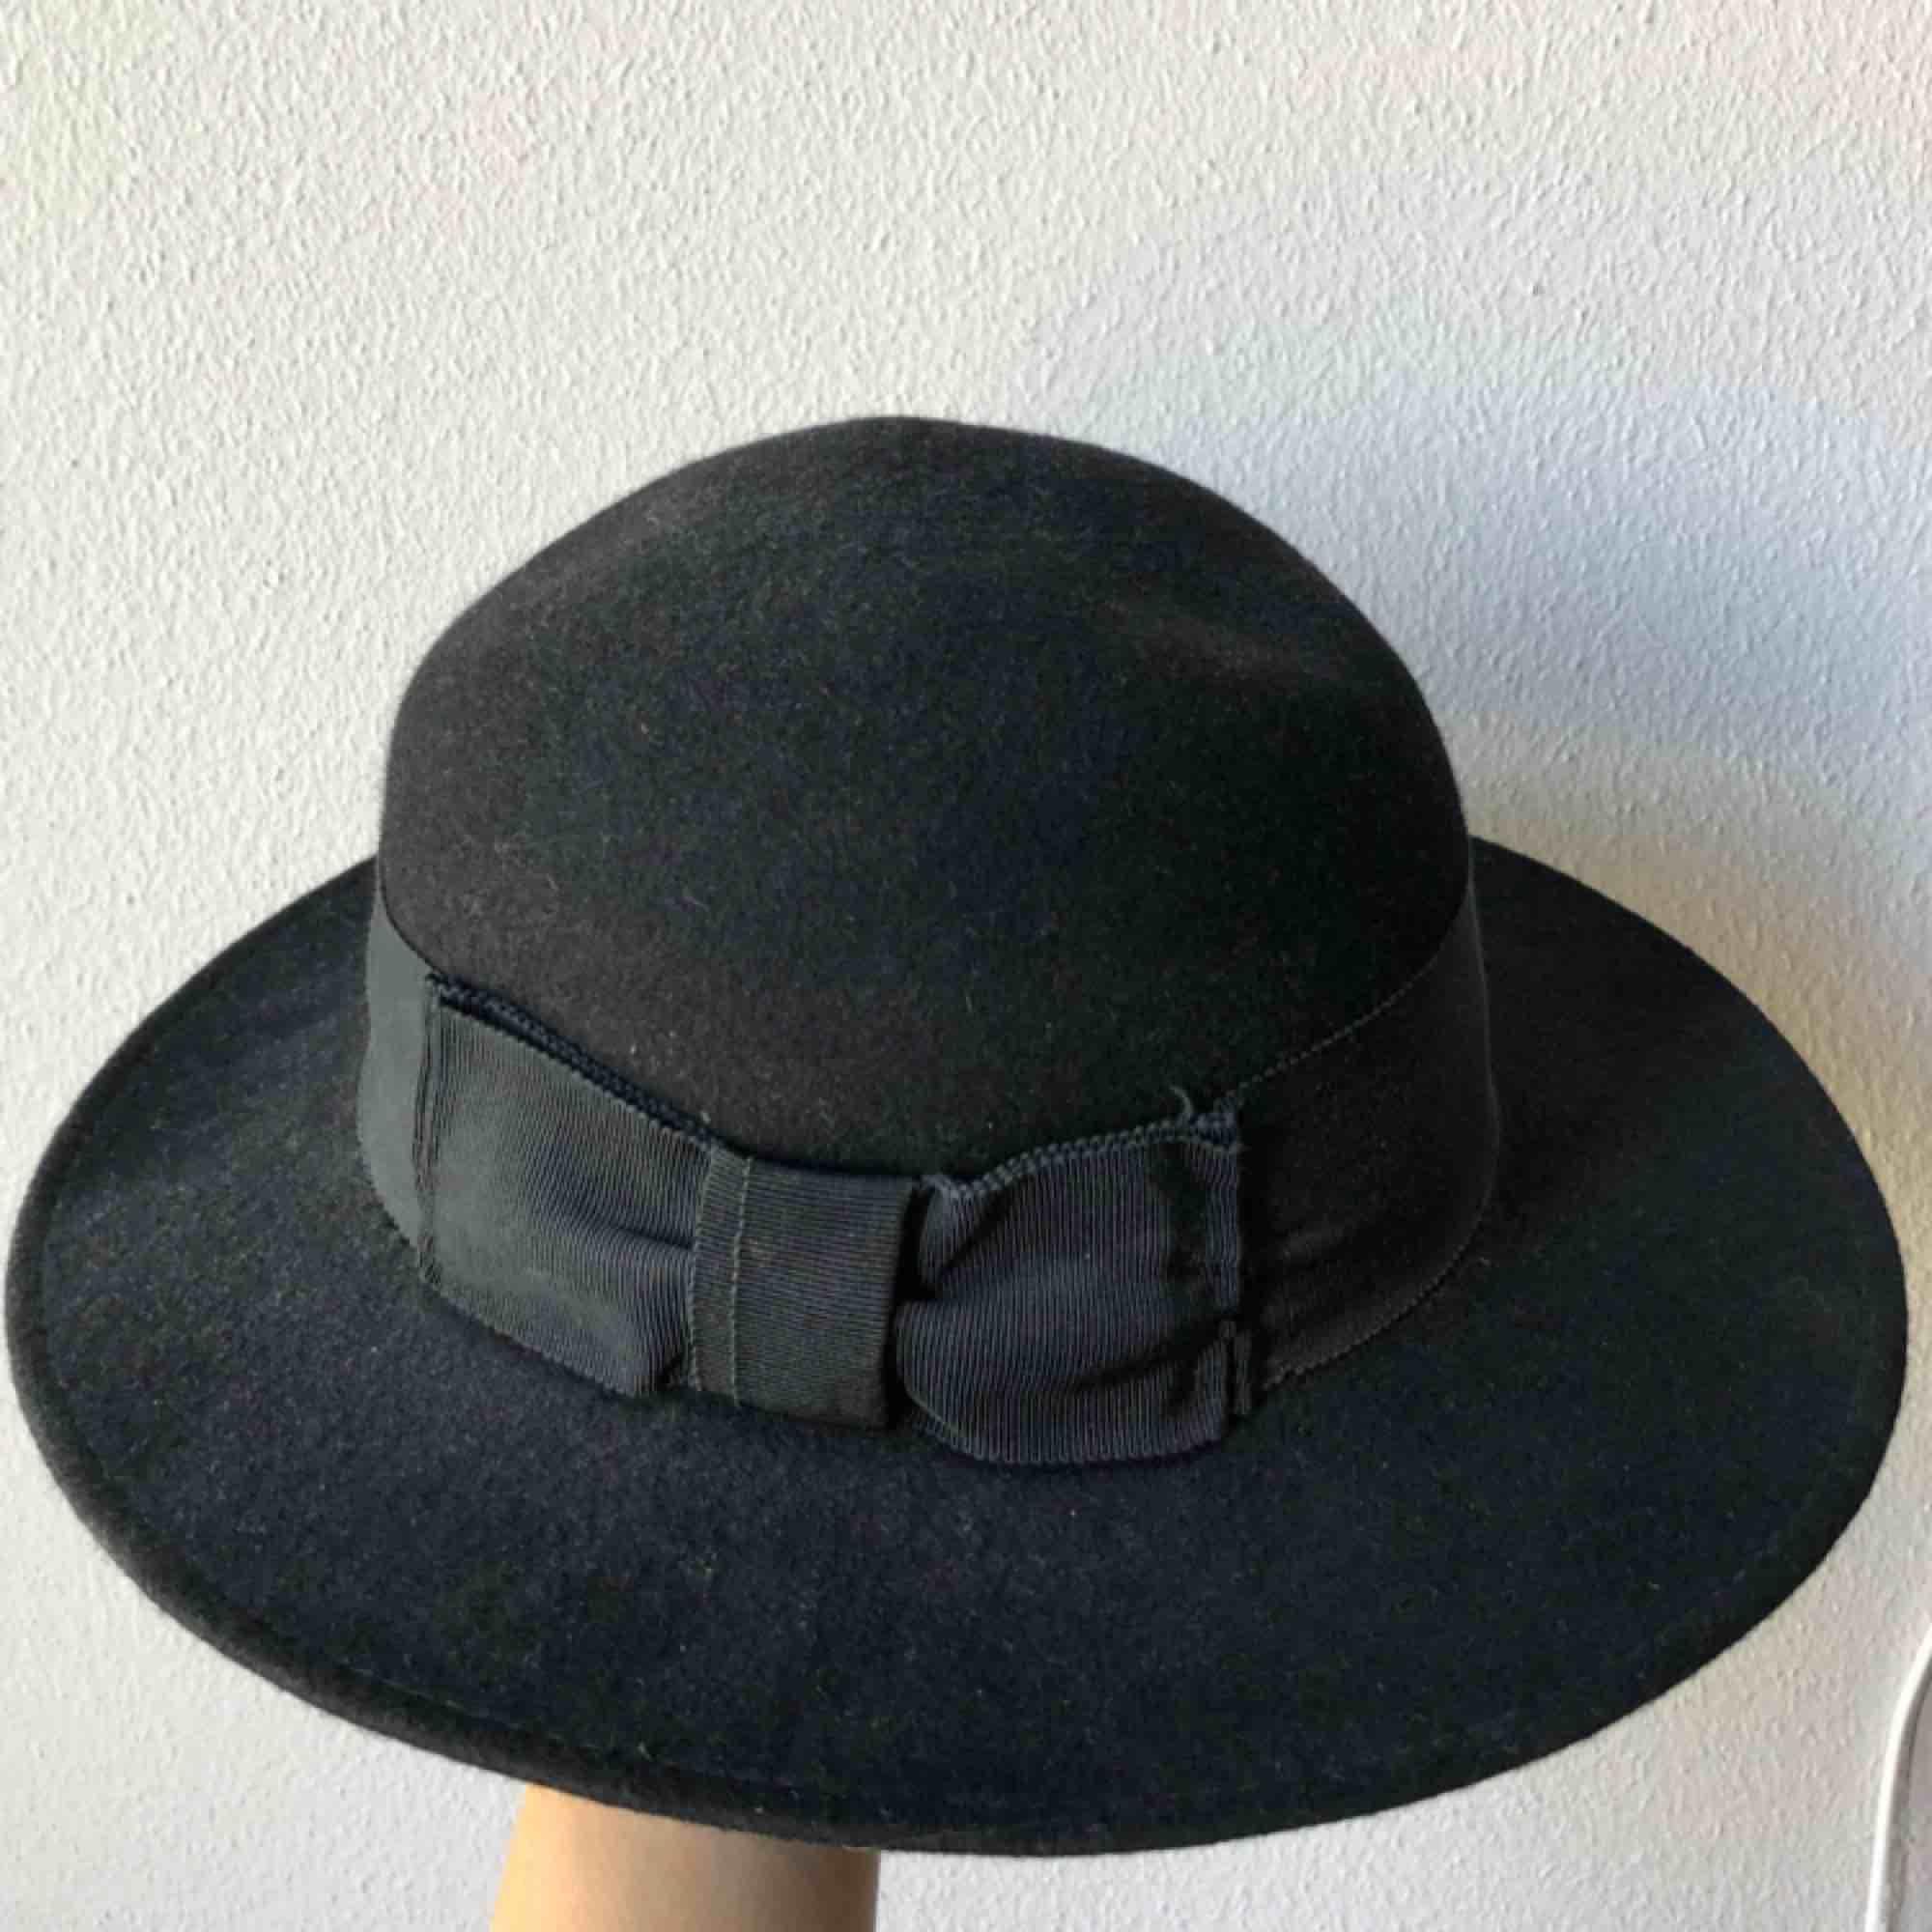 Svart stor hatt i filttyg. Accessoarer.